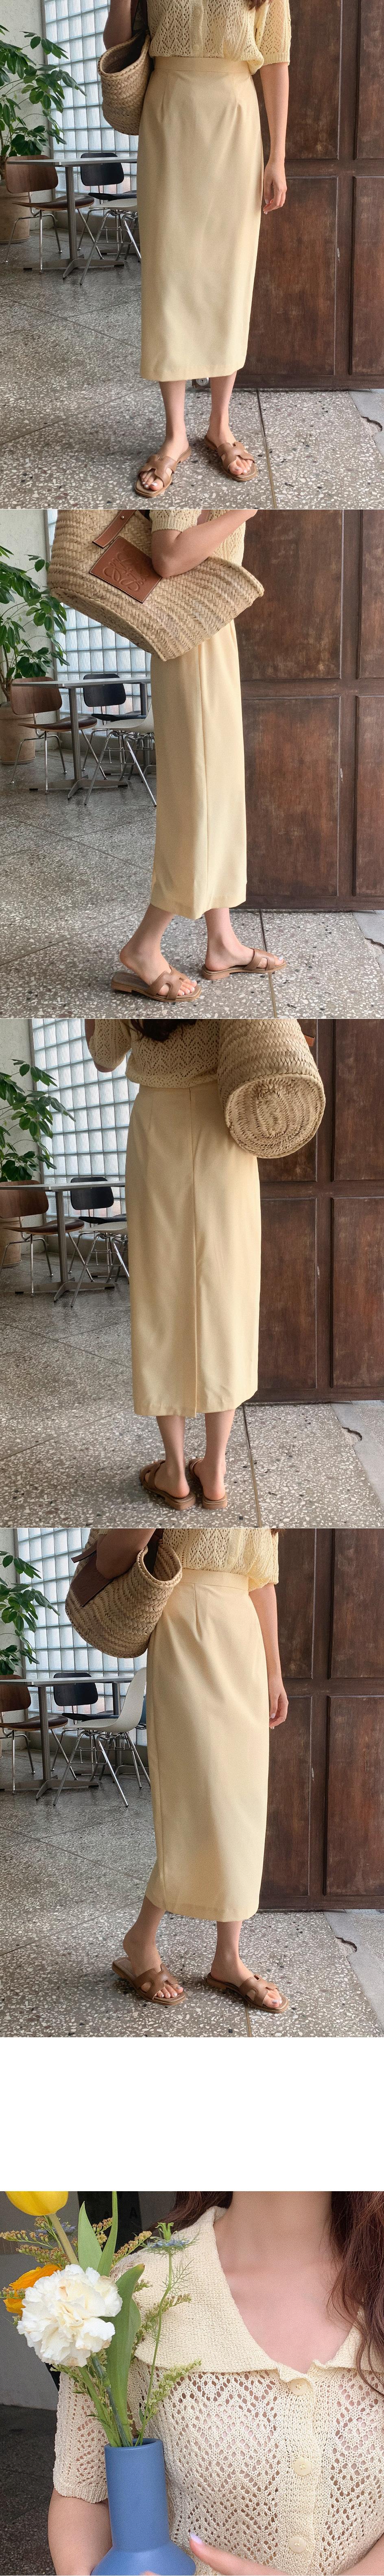 pebble skirt cardigan